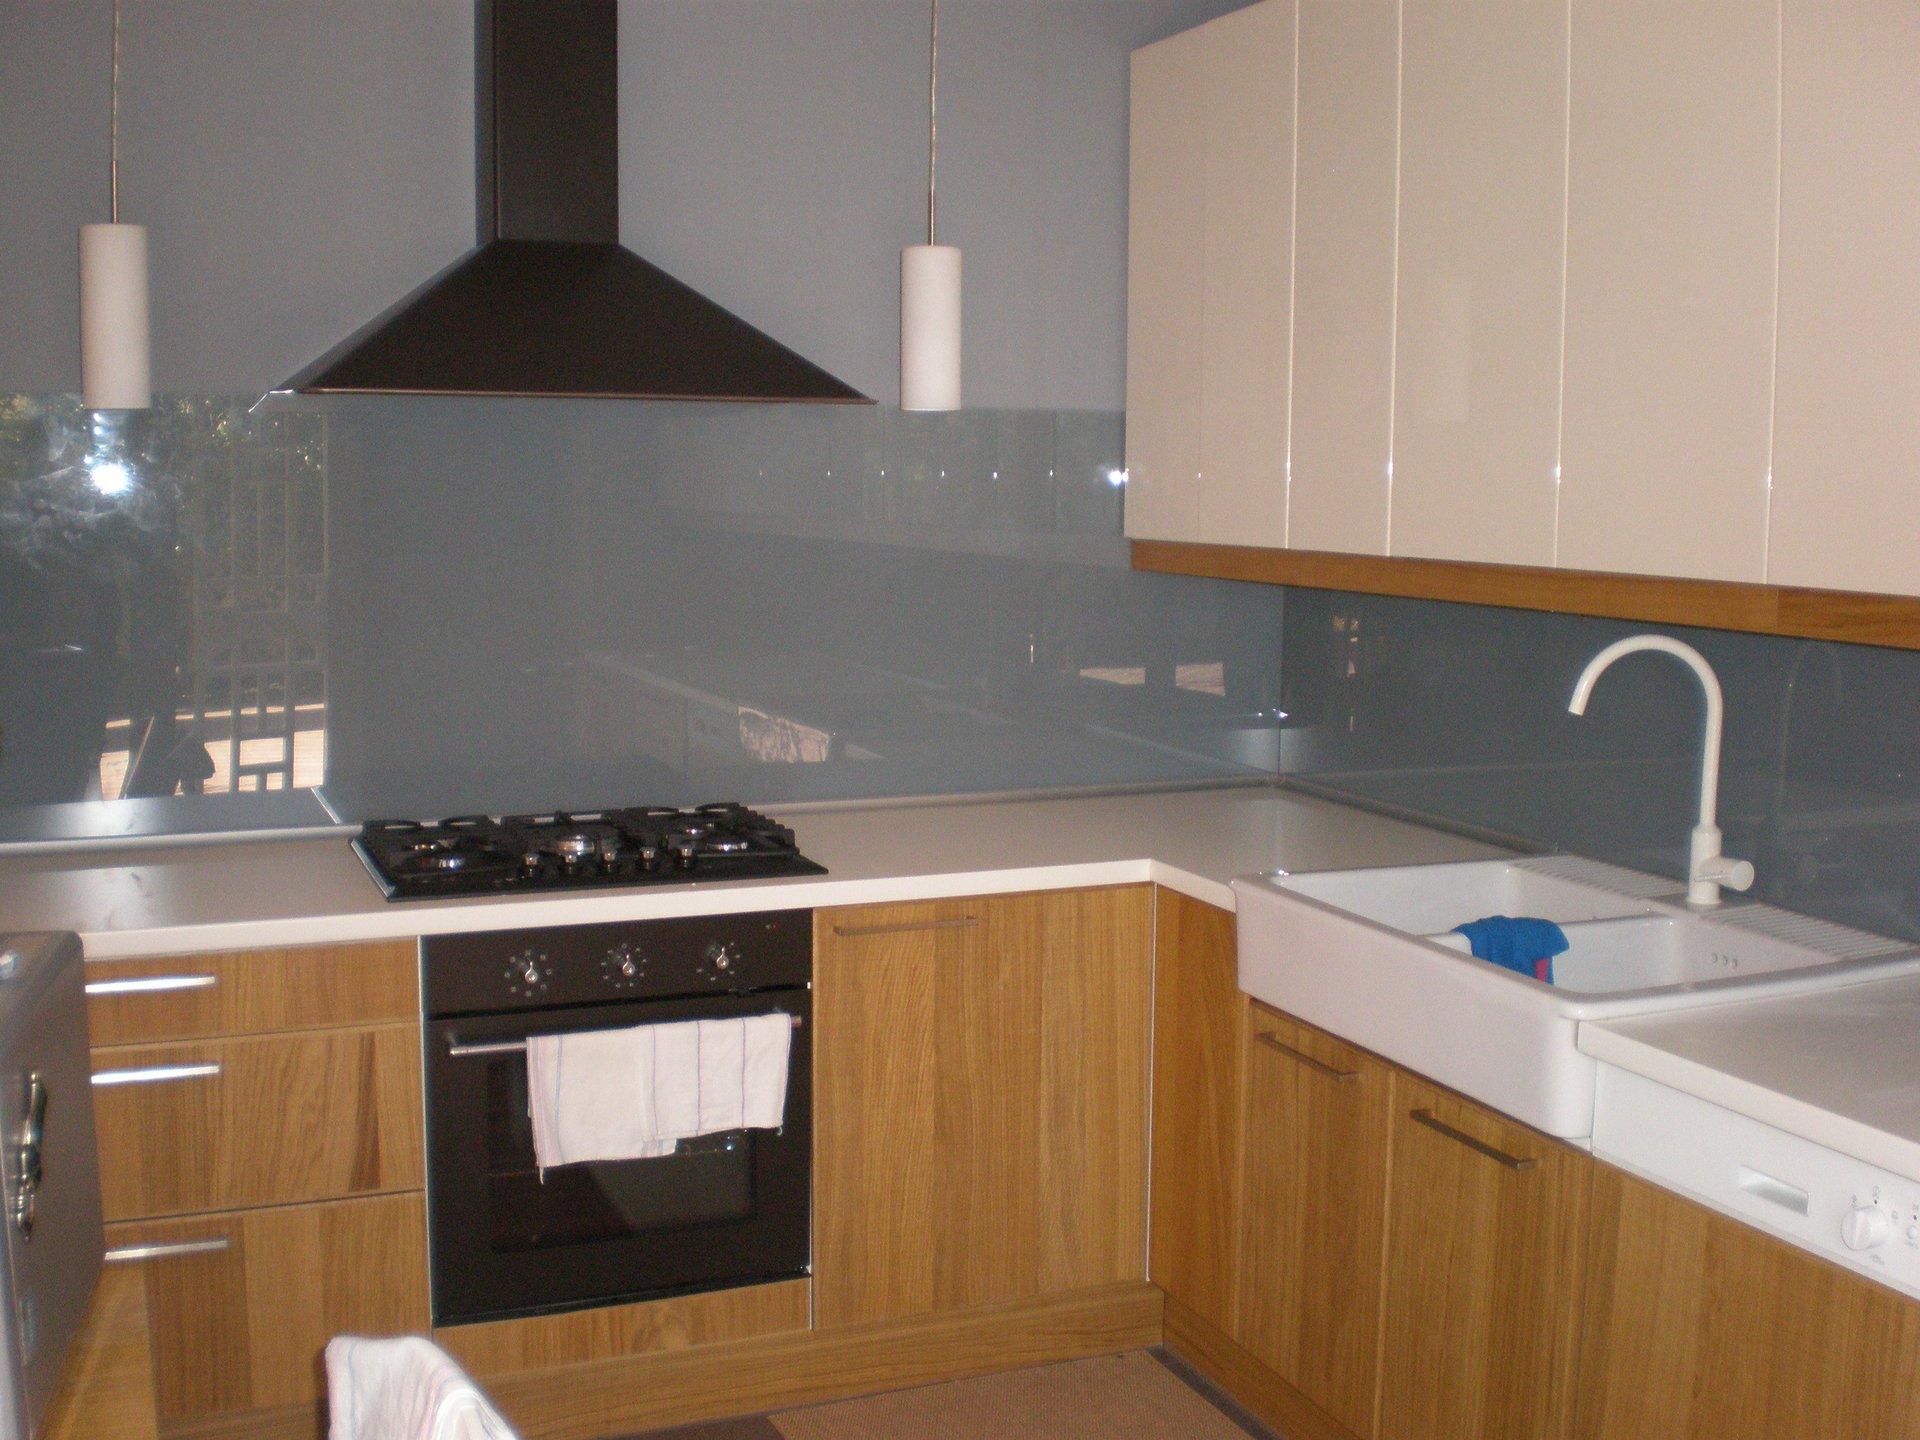 Alzata cucina stunning alzata cucina with alzata cucina - Schienale cucina vetro ...